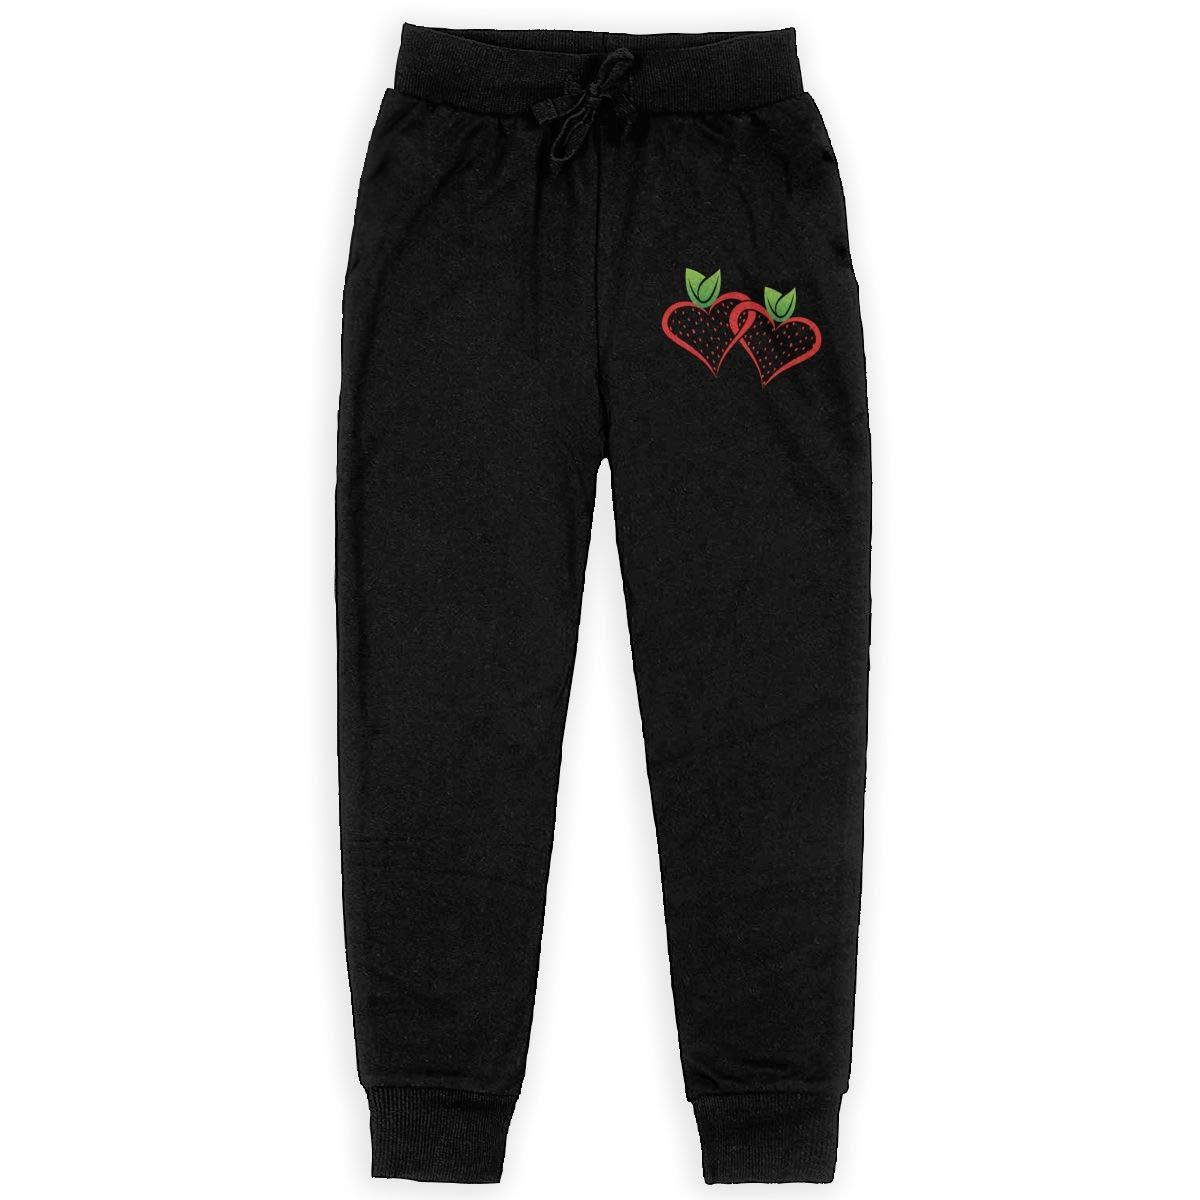 Dunpaiaa Strawberry Logo Boys Sweatpants,Joggers Sport Training Pants Trousers Black